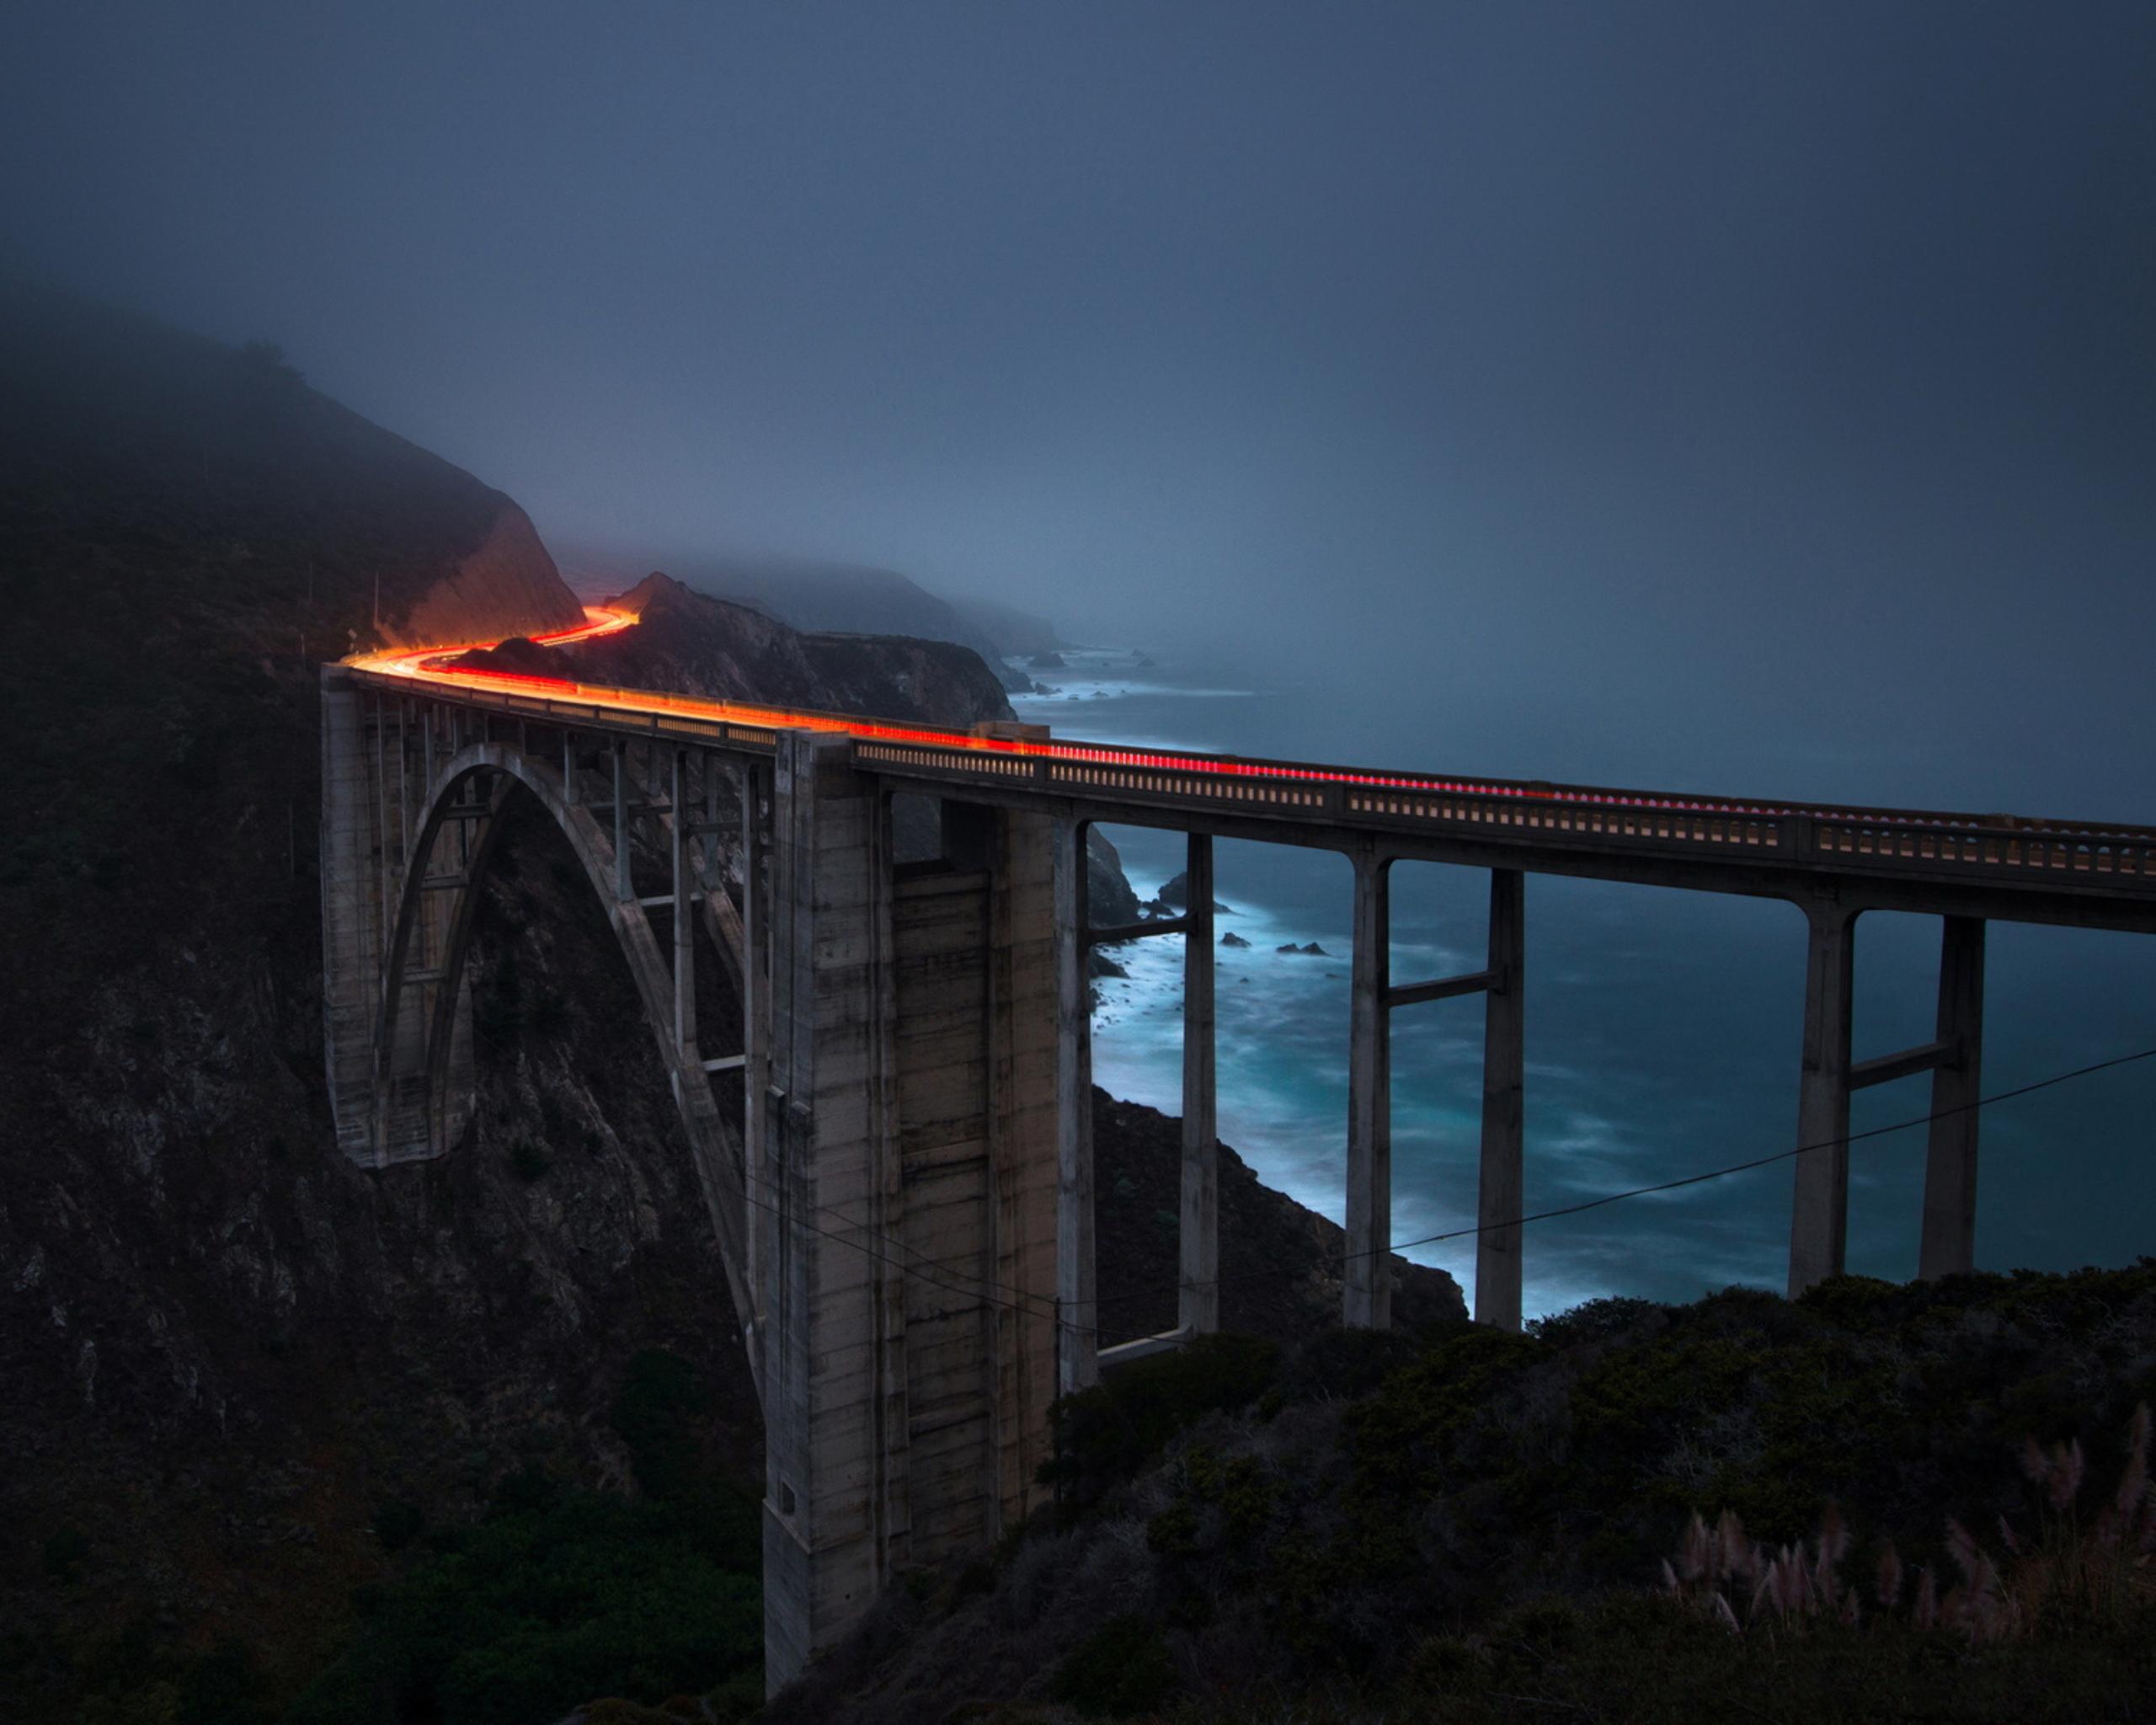 Обои железная дорога, туман, мост. Разное foto 19